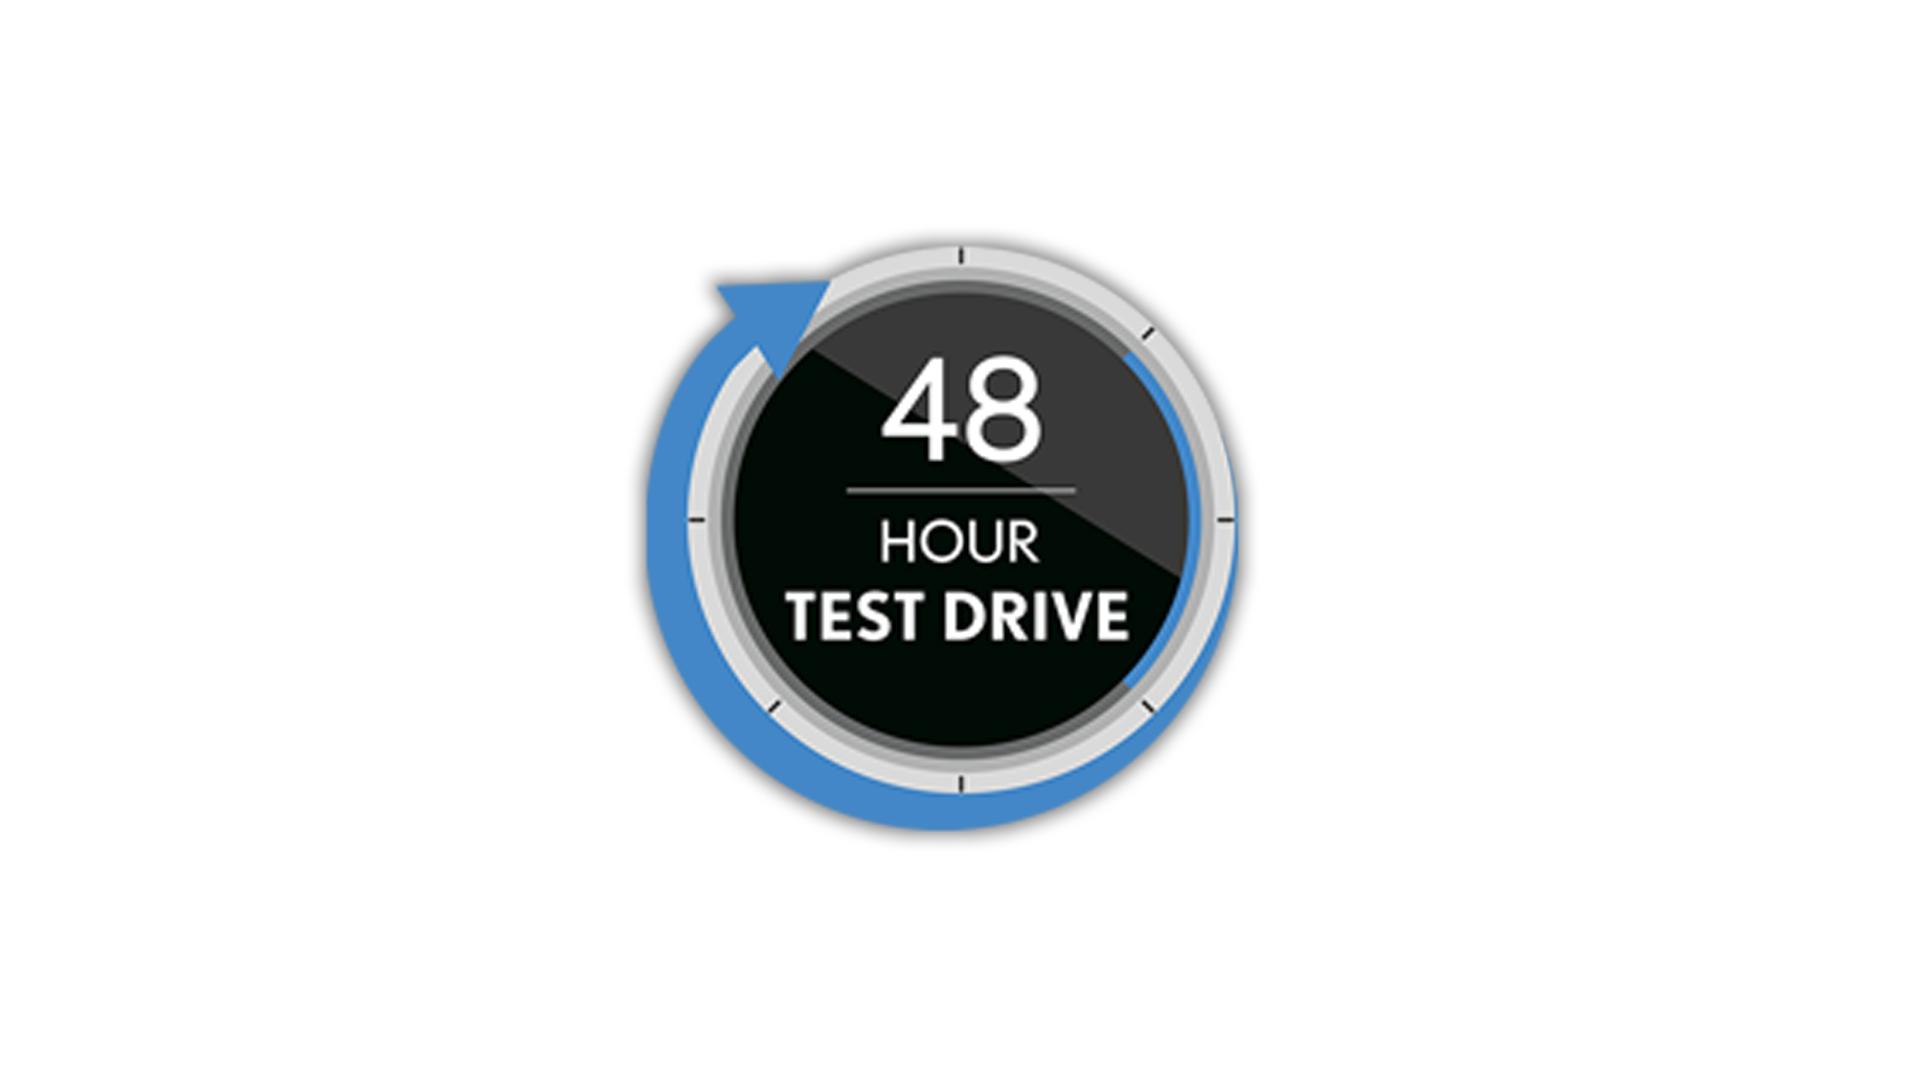 48 hour testdrive logo